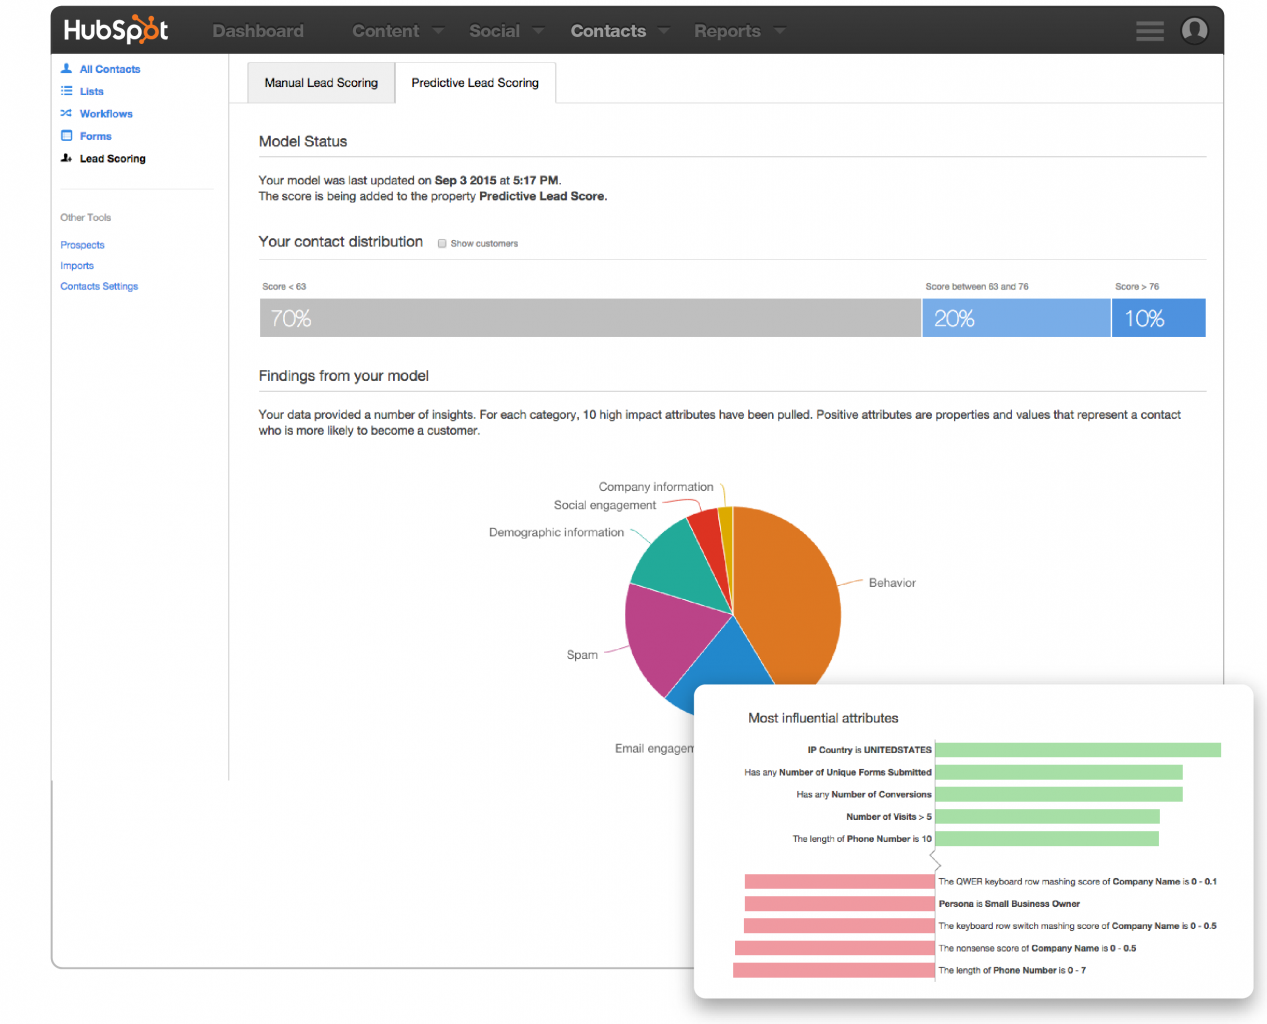 A predictive lead scoring model in HubSpot